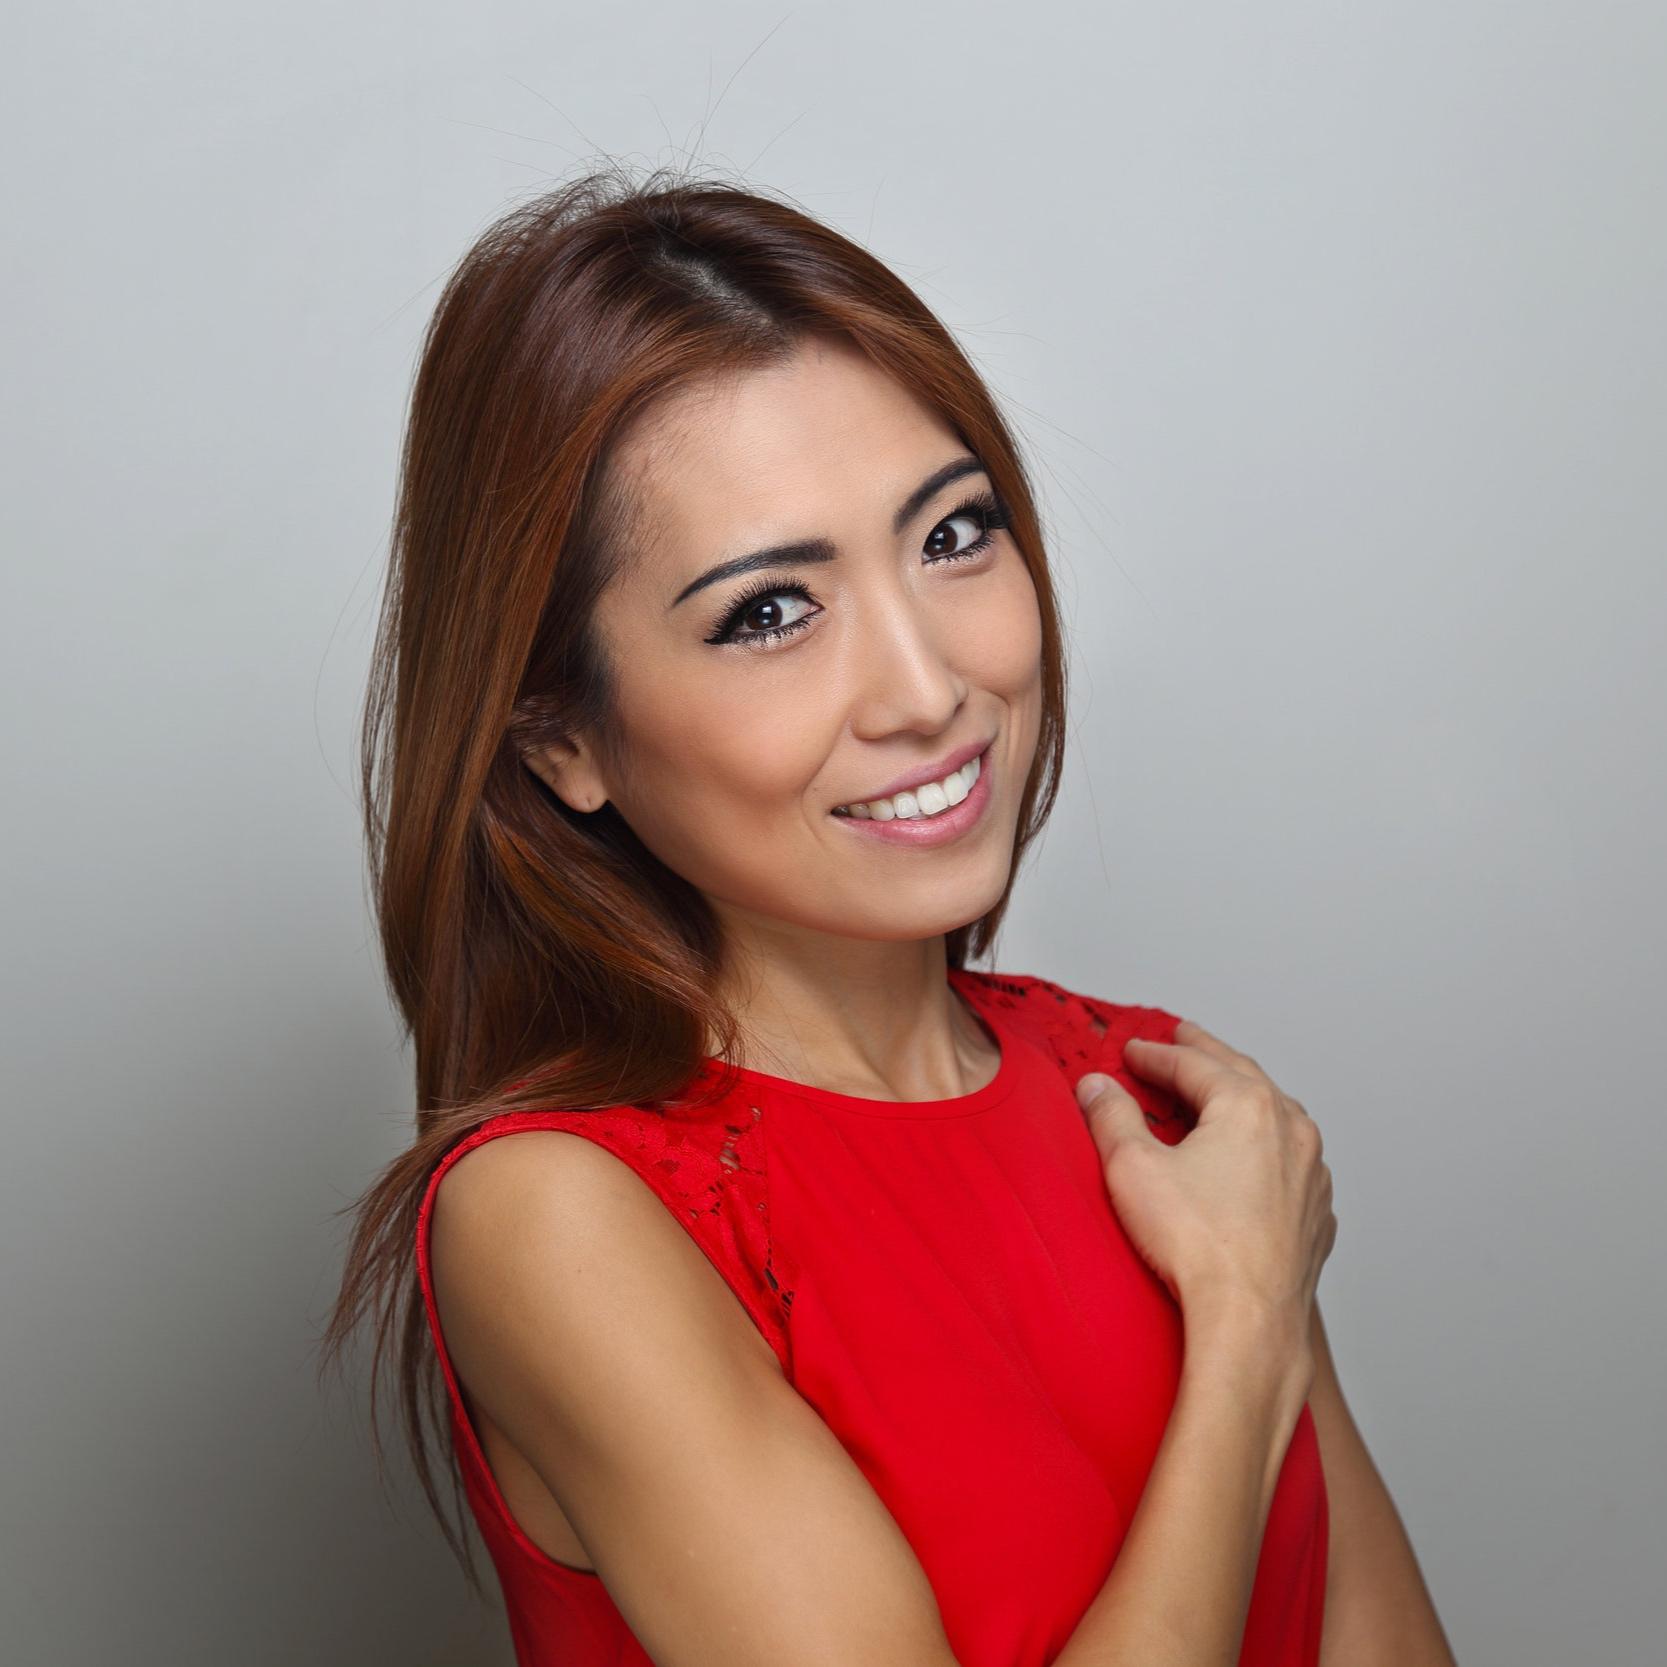 Dr. Mijin Choi - Binghamton University声乐及歌剧指导伯明翰大学